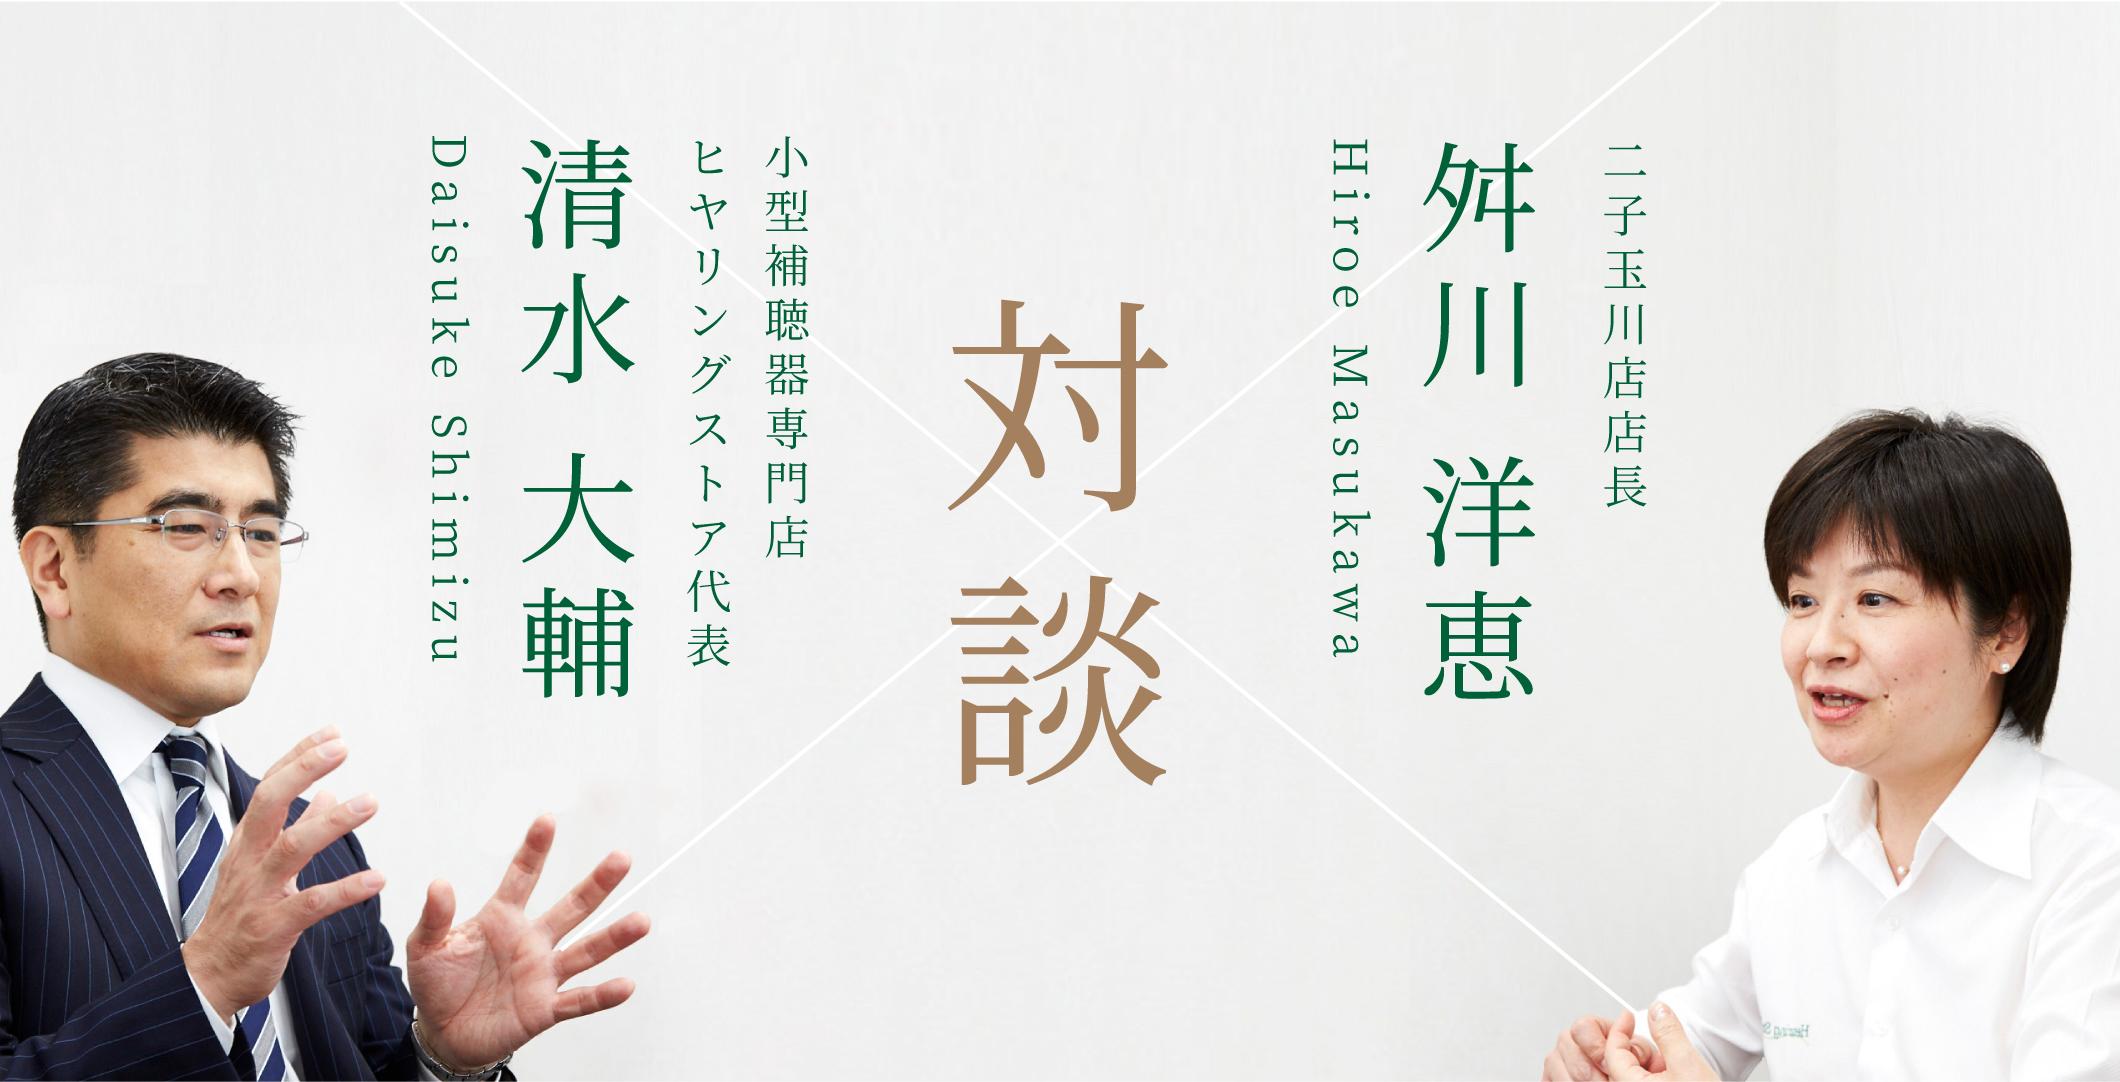 二子玉川店店長 舛川 洋恵&小型補聴器専門店ヒヤリングストア代表 清水 大輔 対談